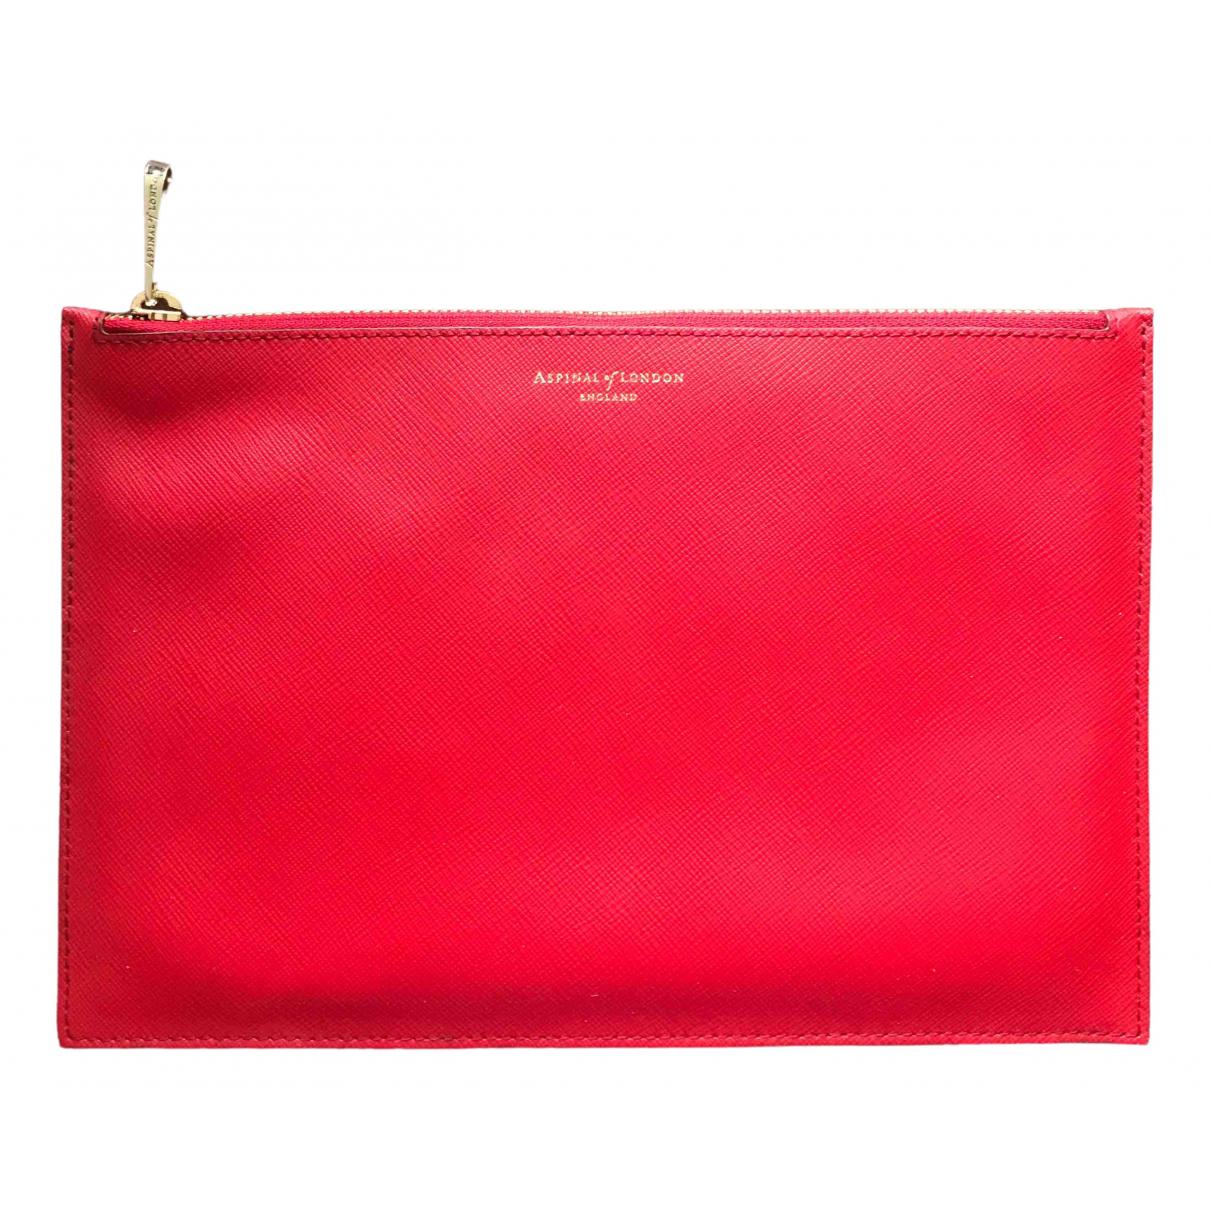 Aspinal Of London \N Clutch in  Rot Leder